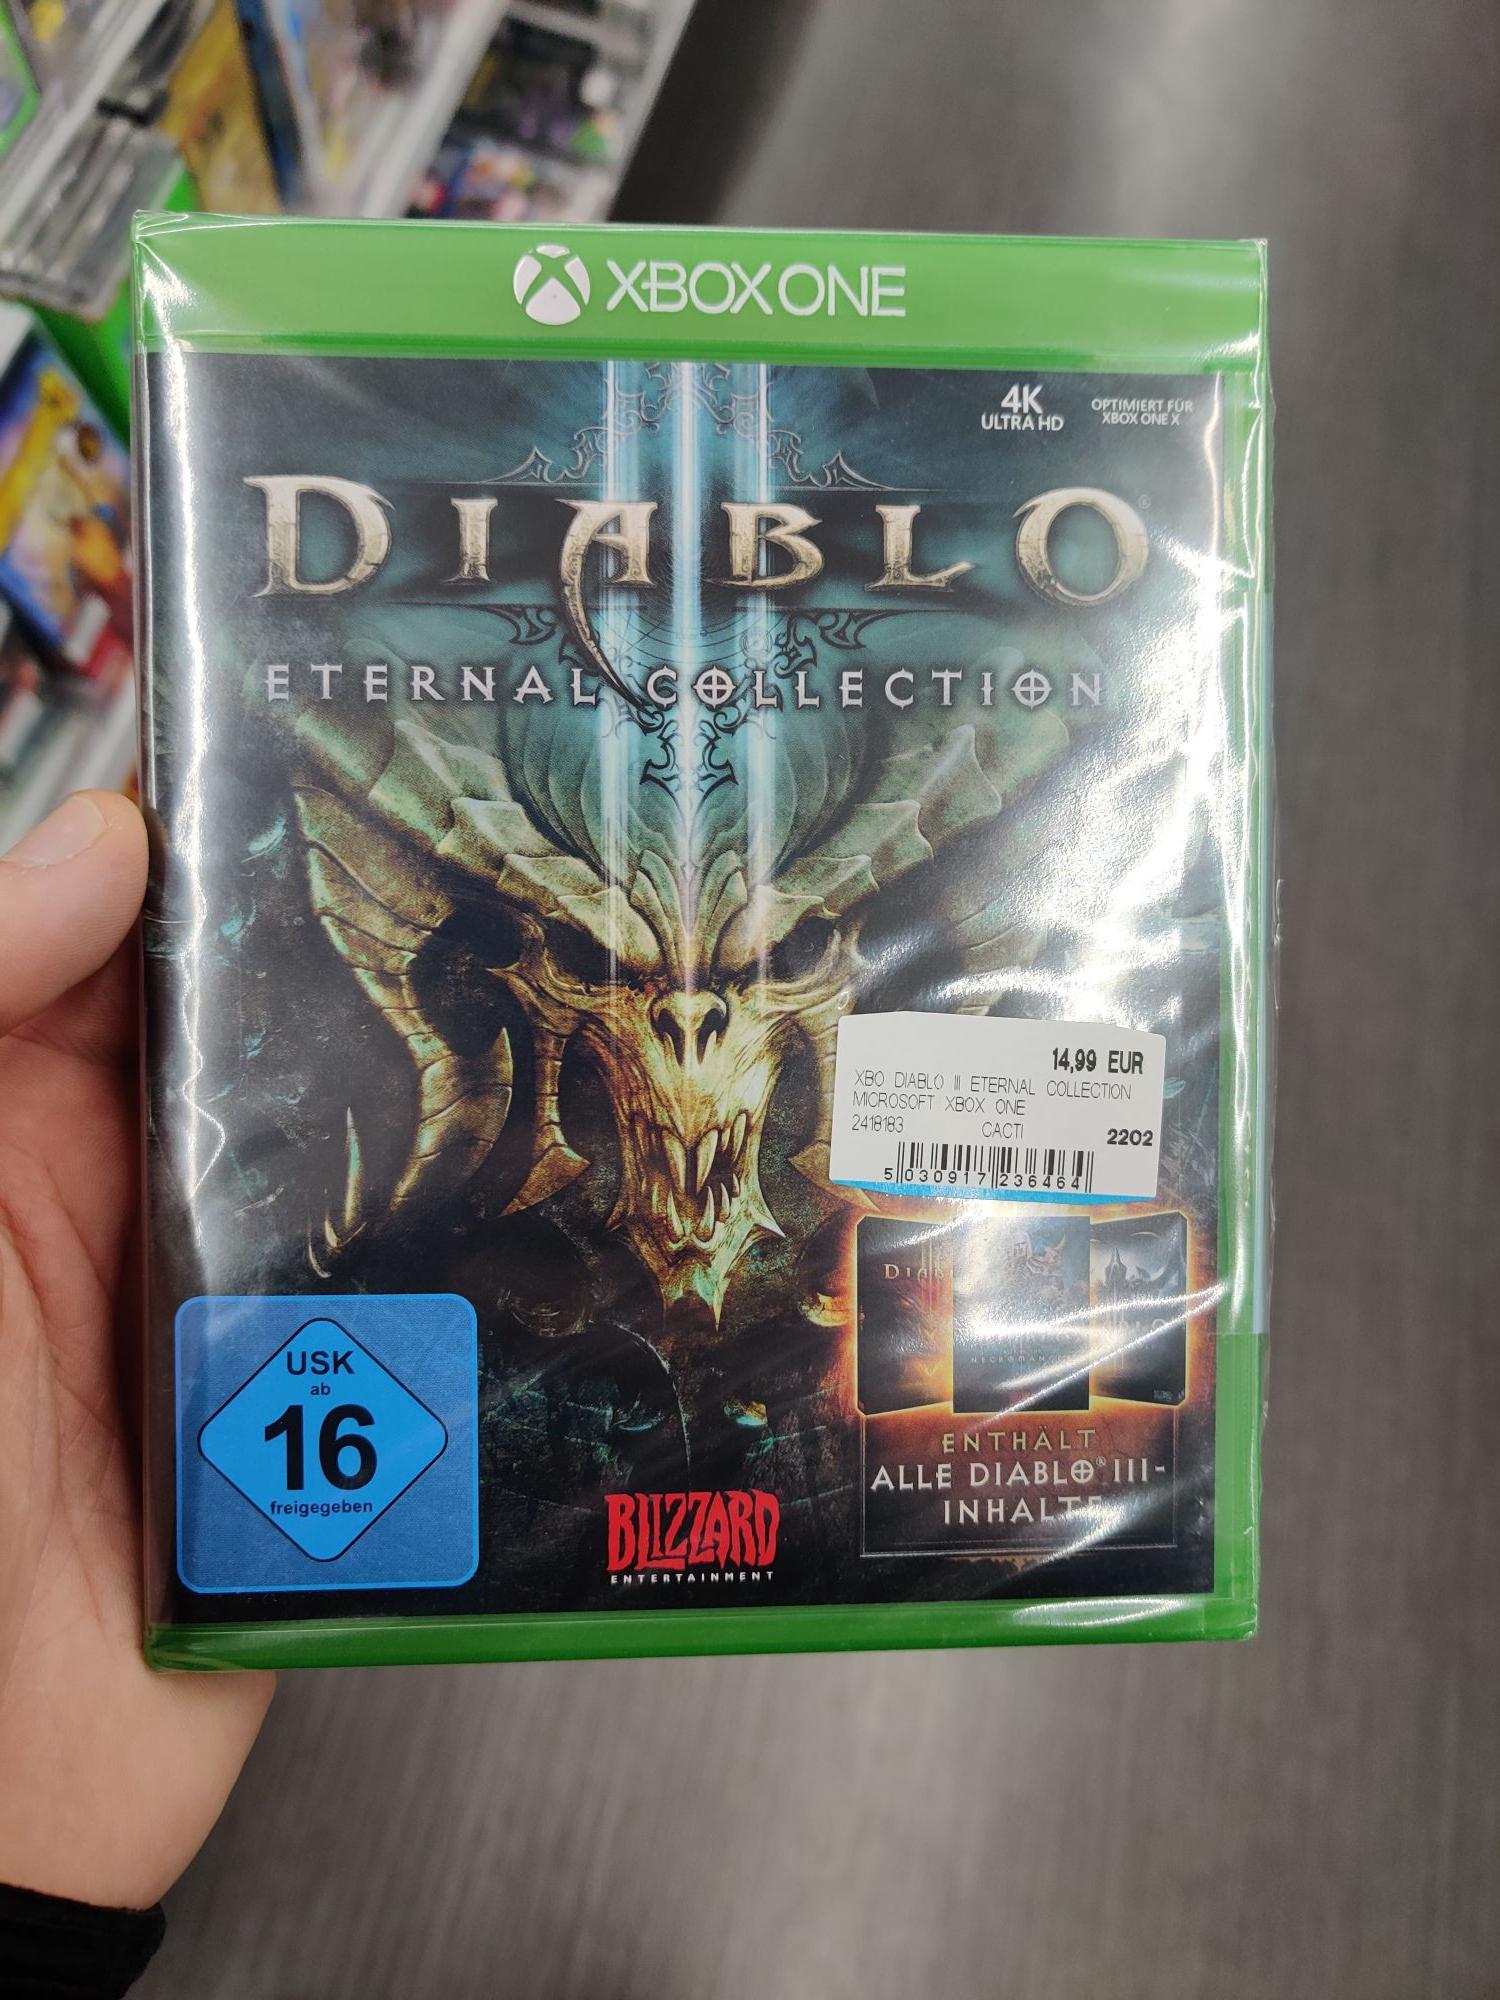 Diablo 3 Eternal Collection XBOX One [MediaMarkt] Nürnberg